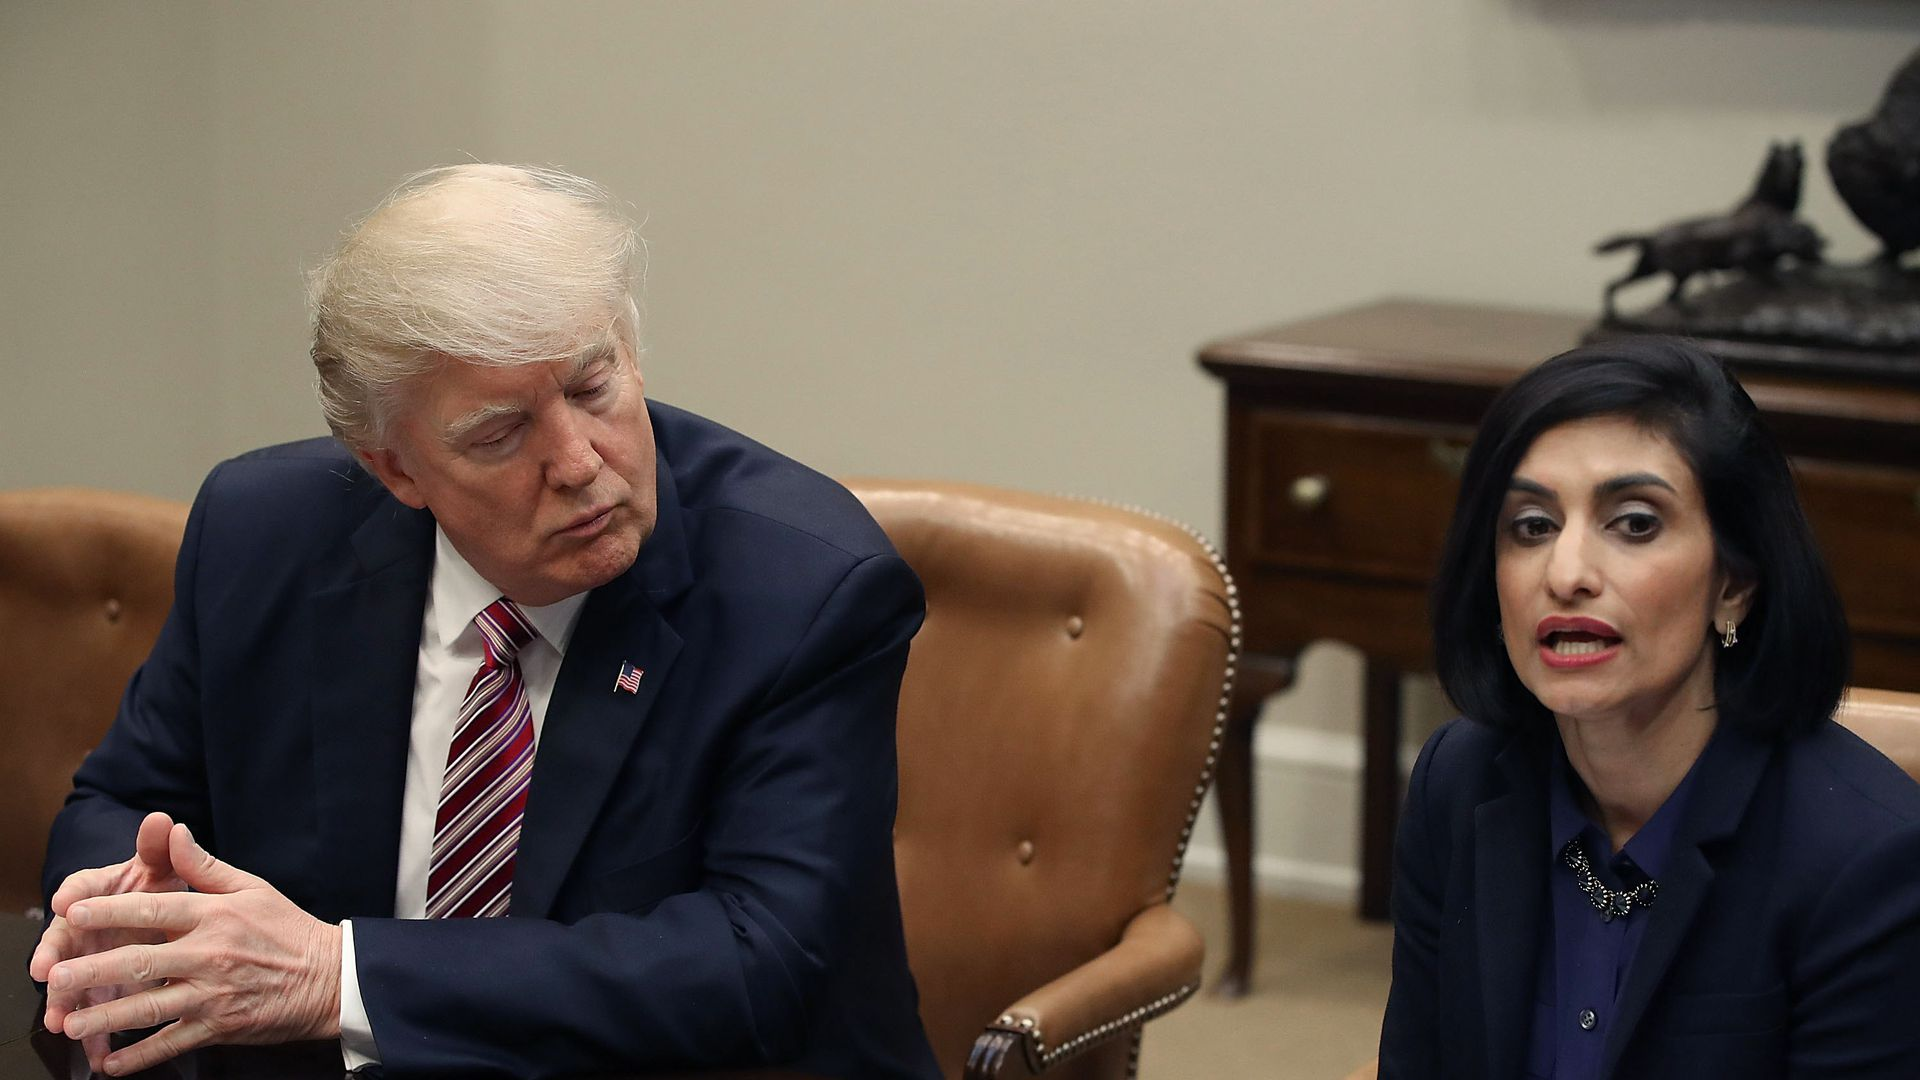 President Trump listens to CMS Administrator Seema Verma